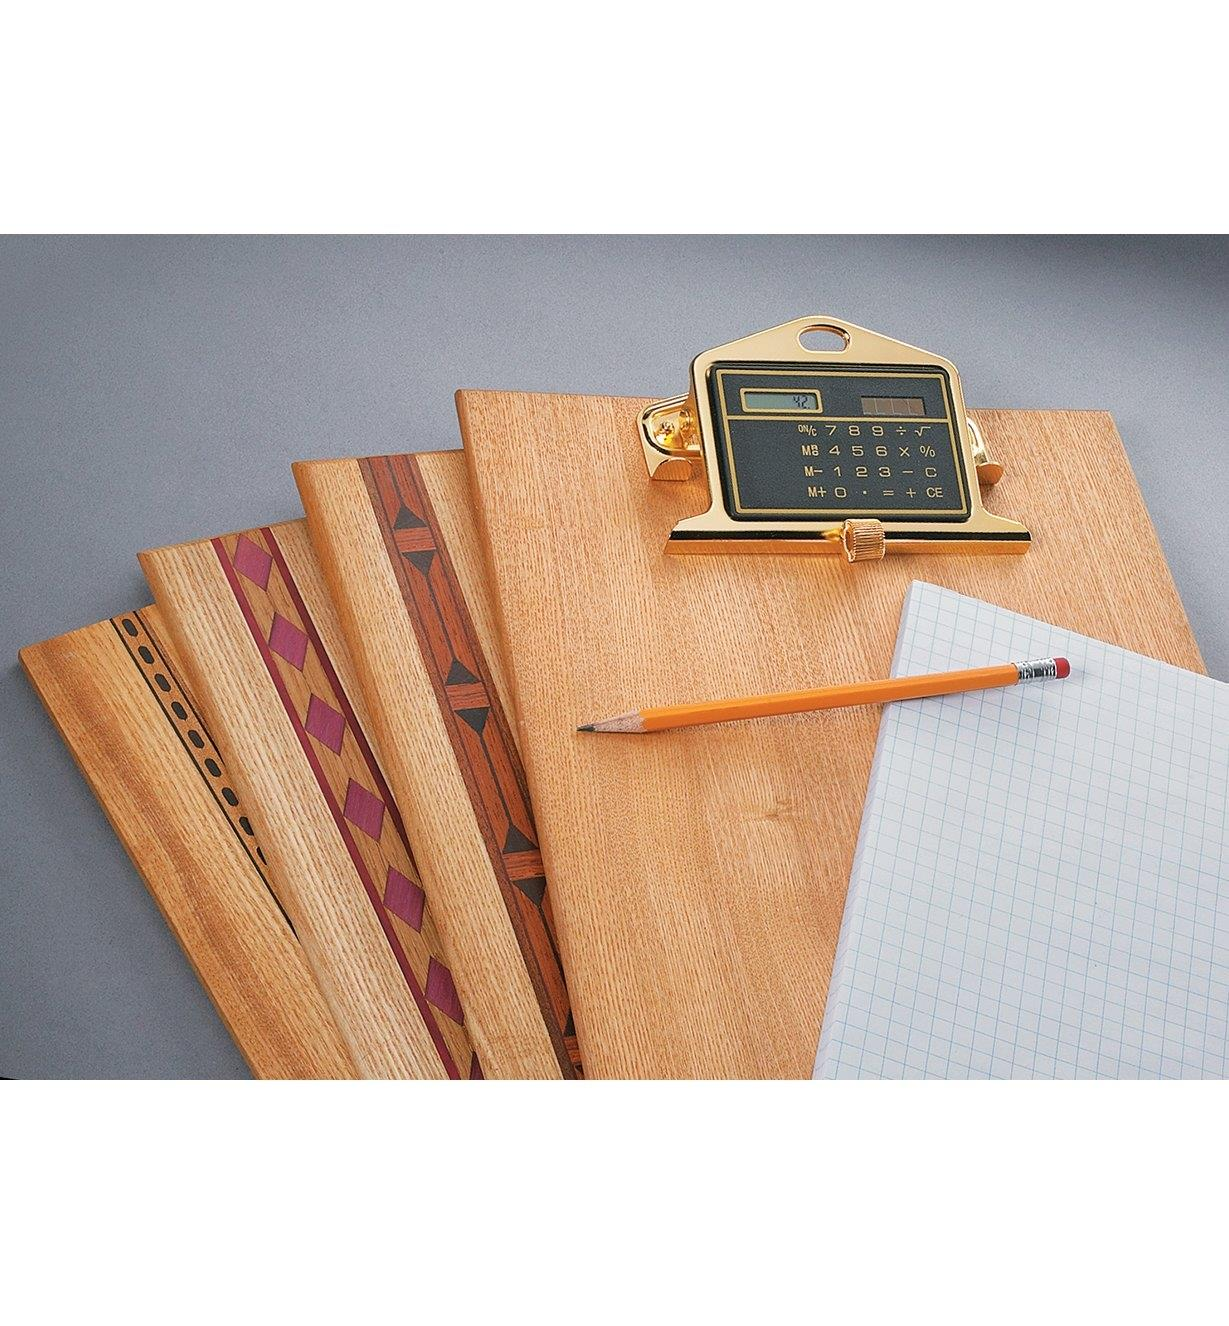 88K7817 - Clipboard Clip and Calculator